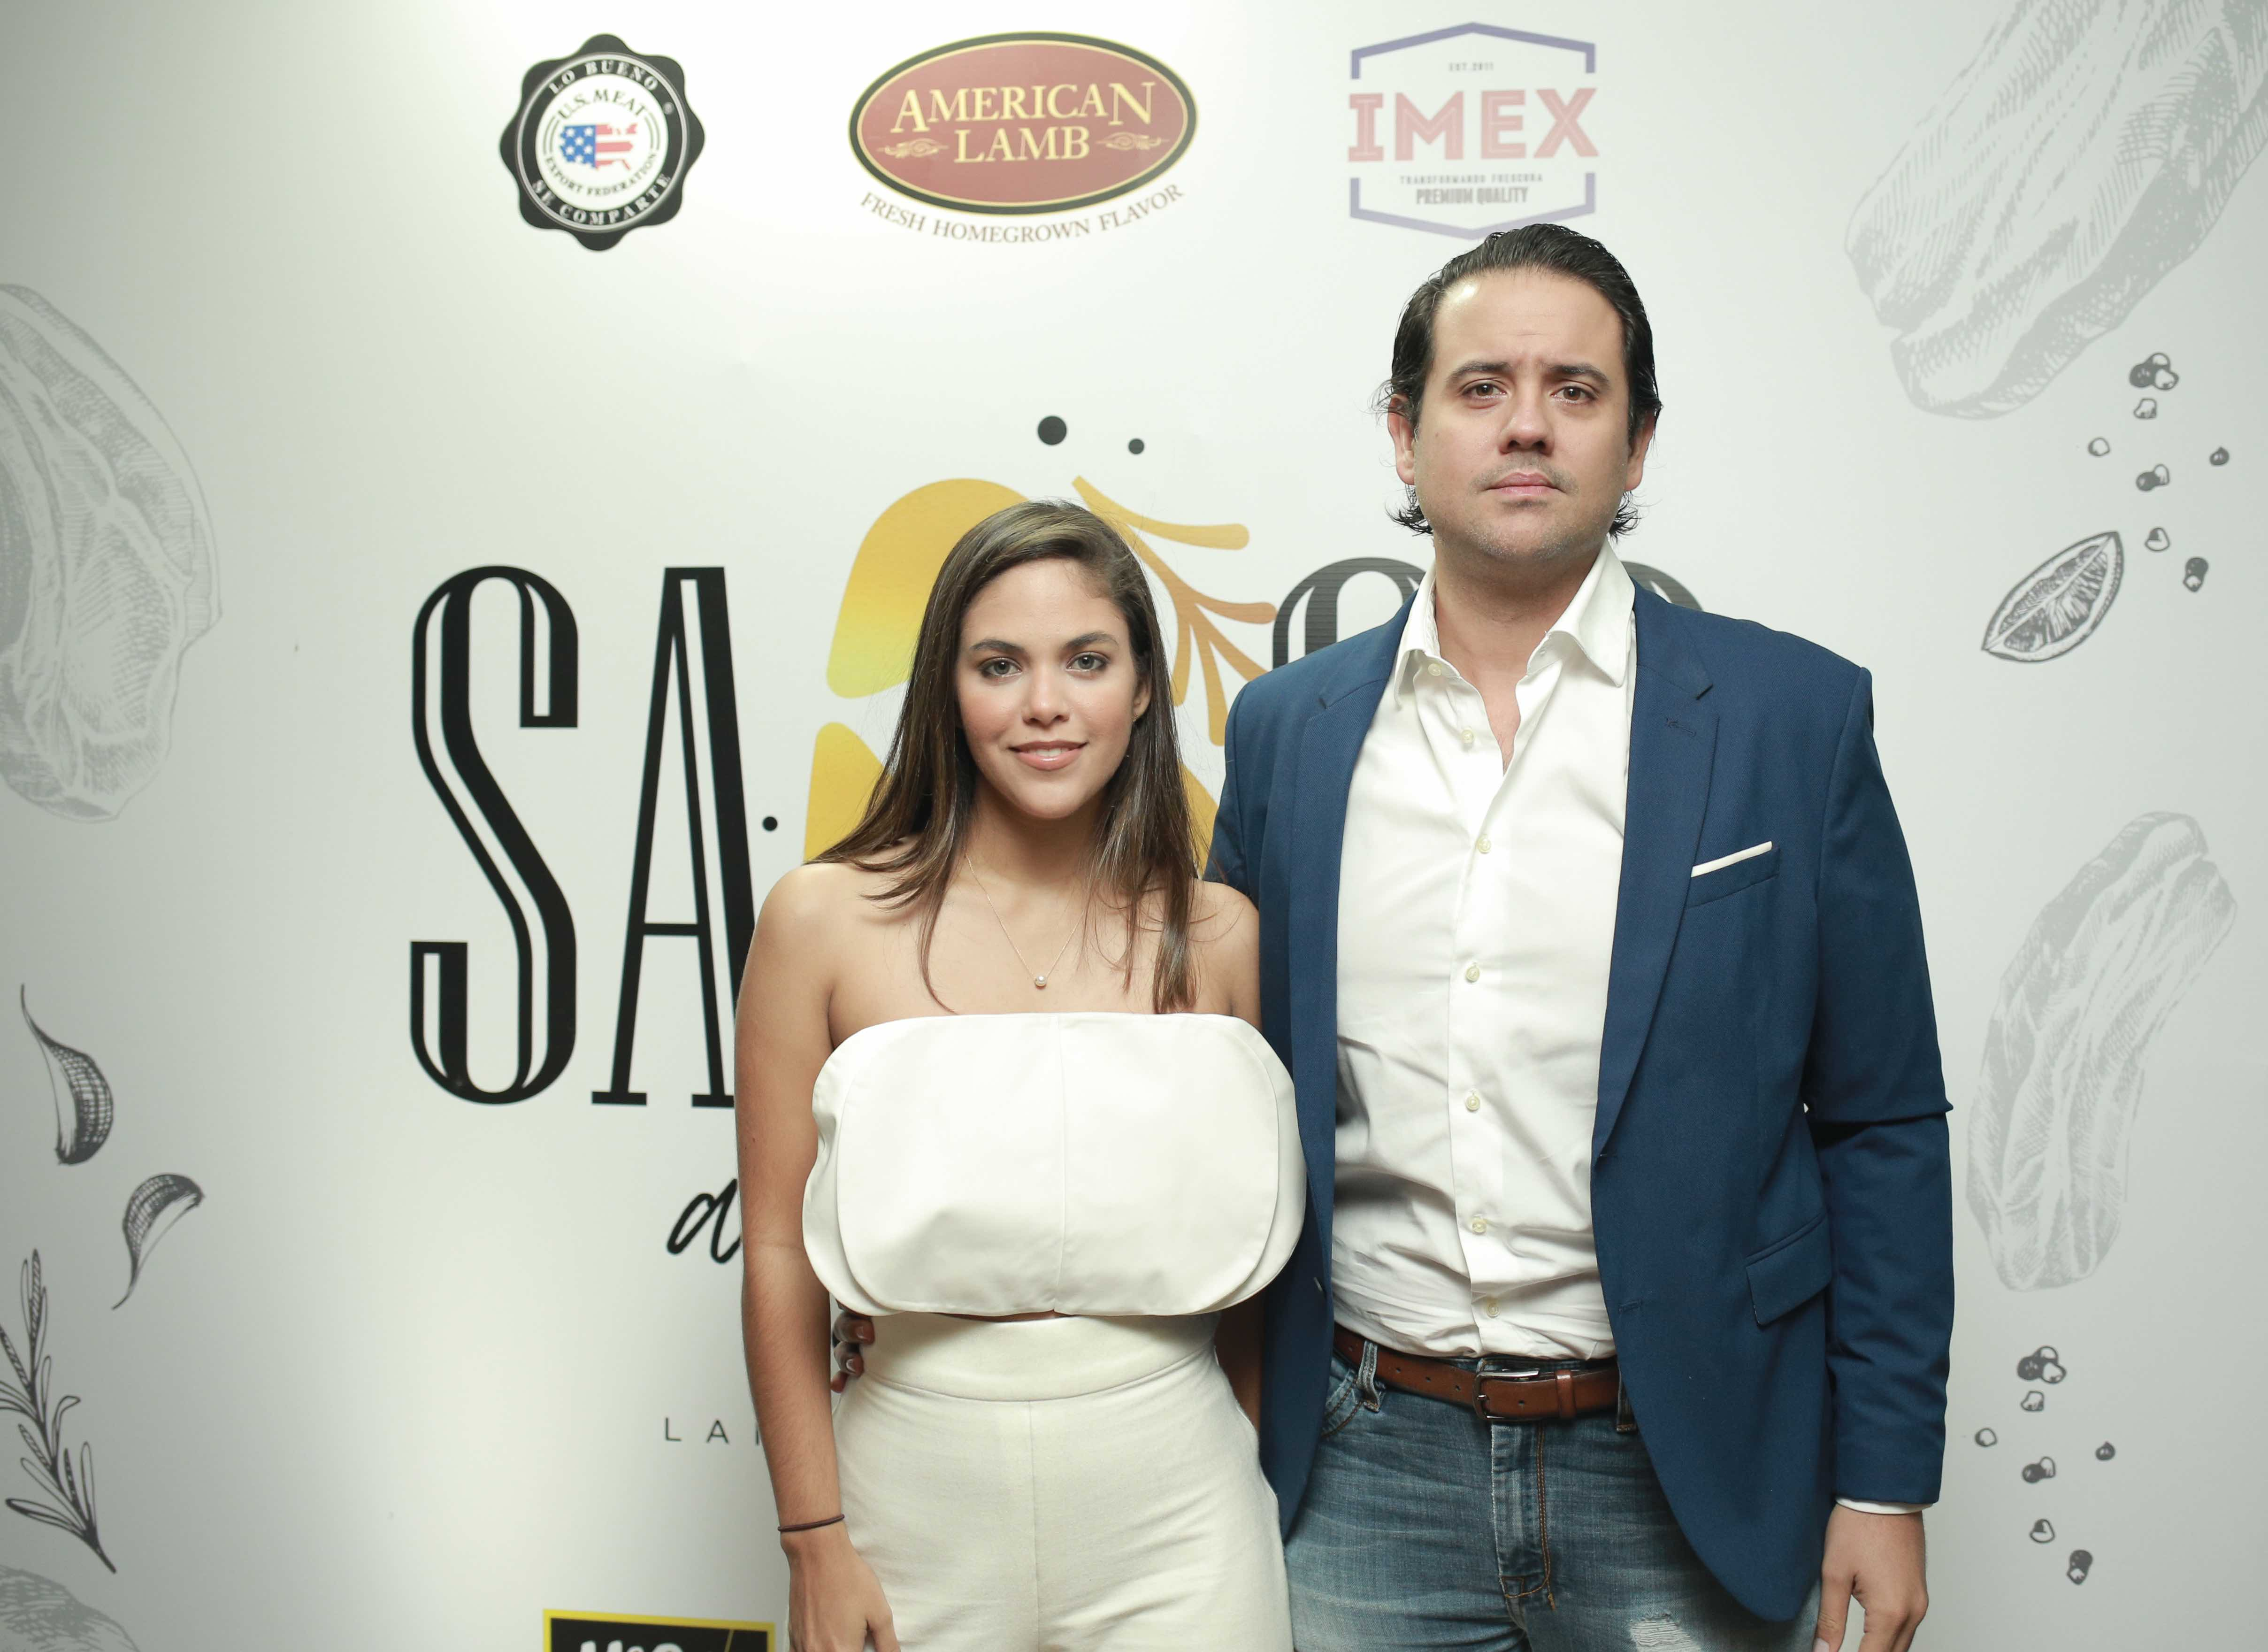 2. Anabella Cordero & Christian Lama